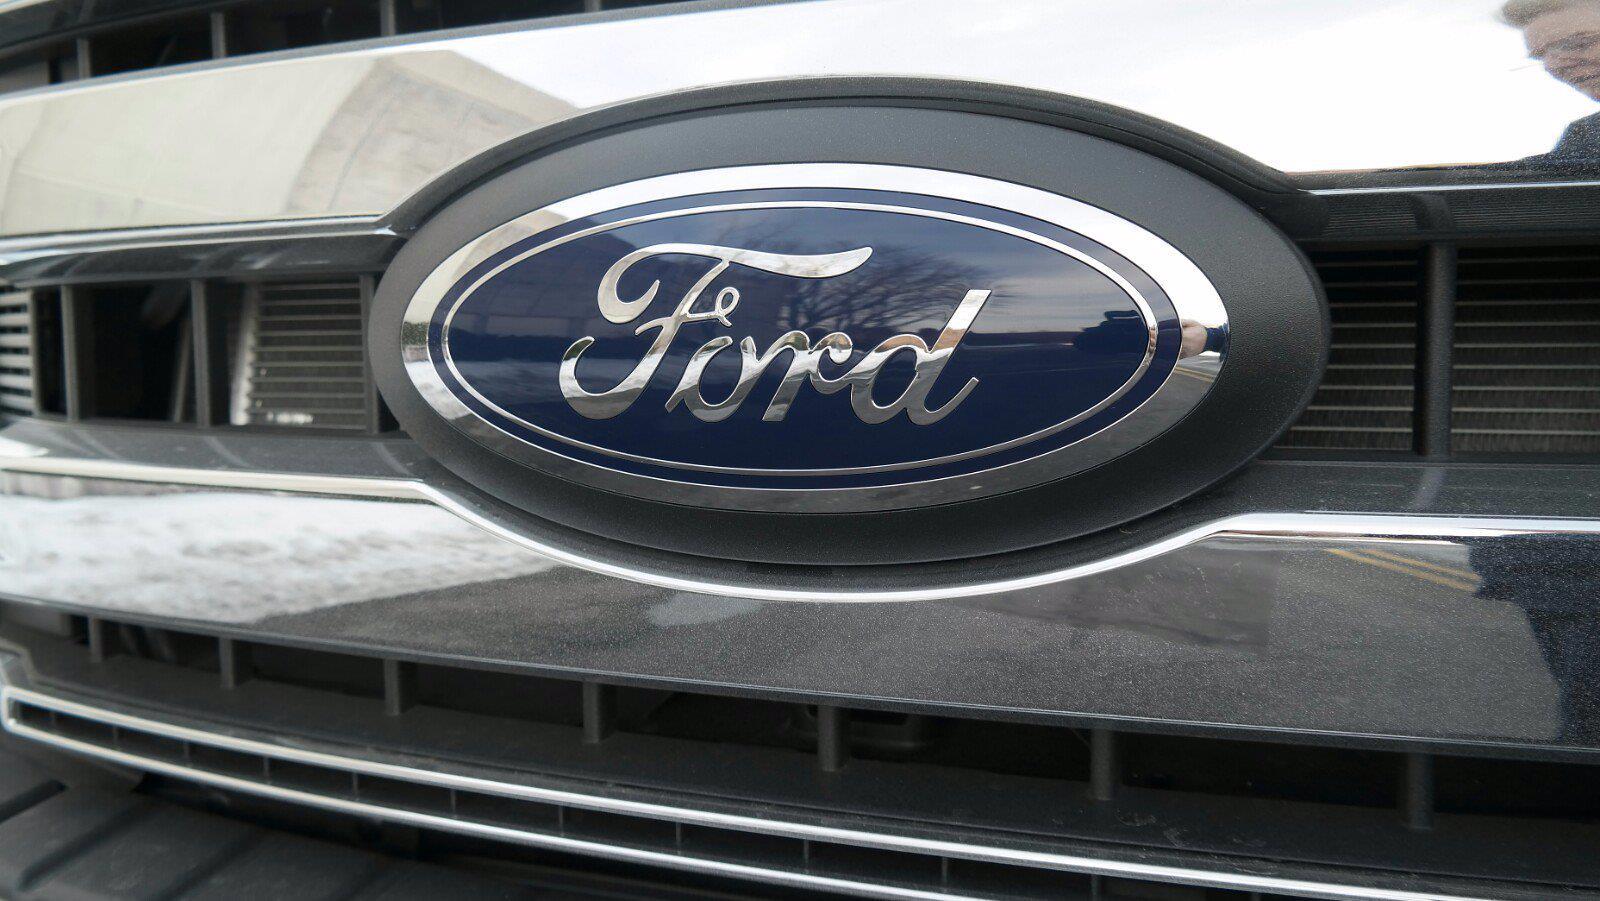 2021 Ford F-600 Regular Cab DRW 4x4, Cab Chassis #FLU10124 - photo 6